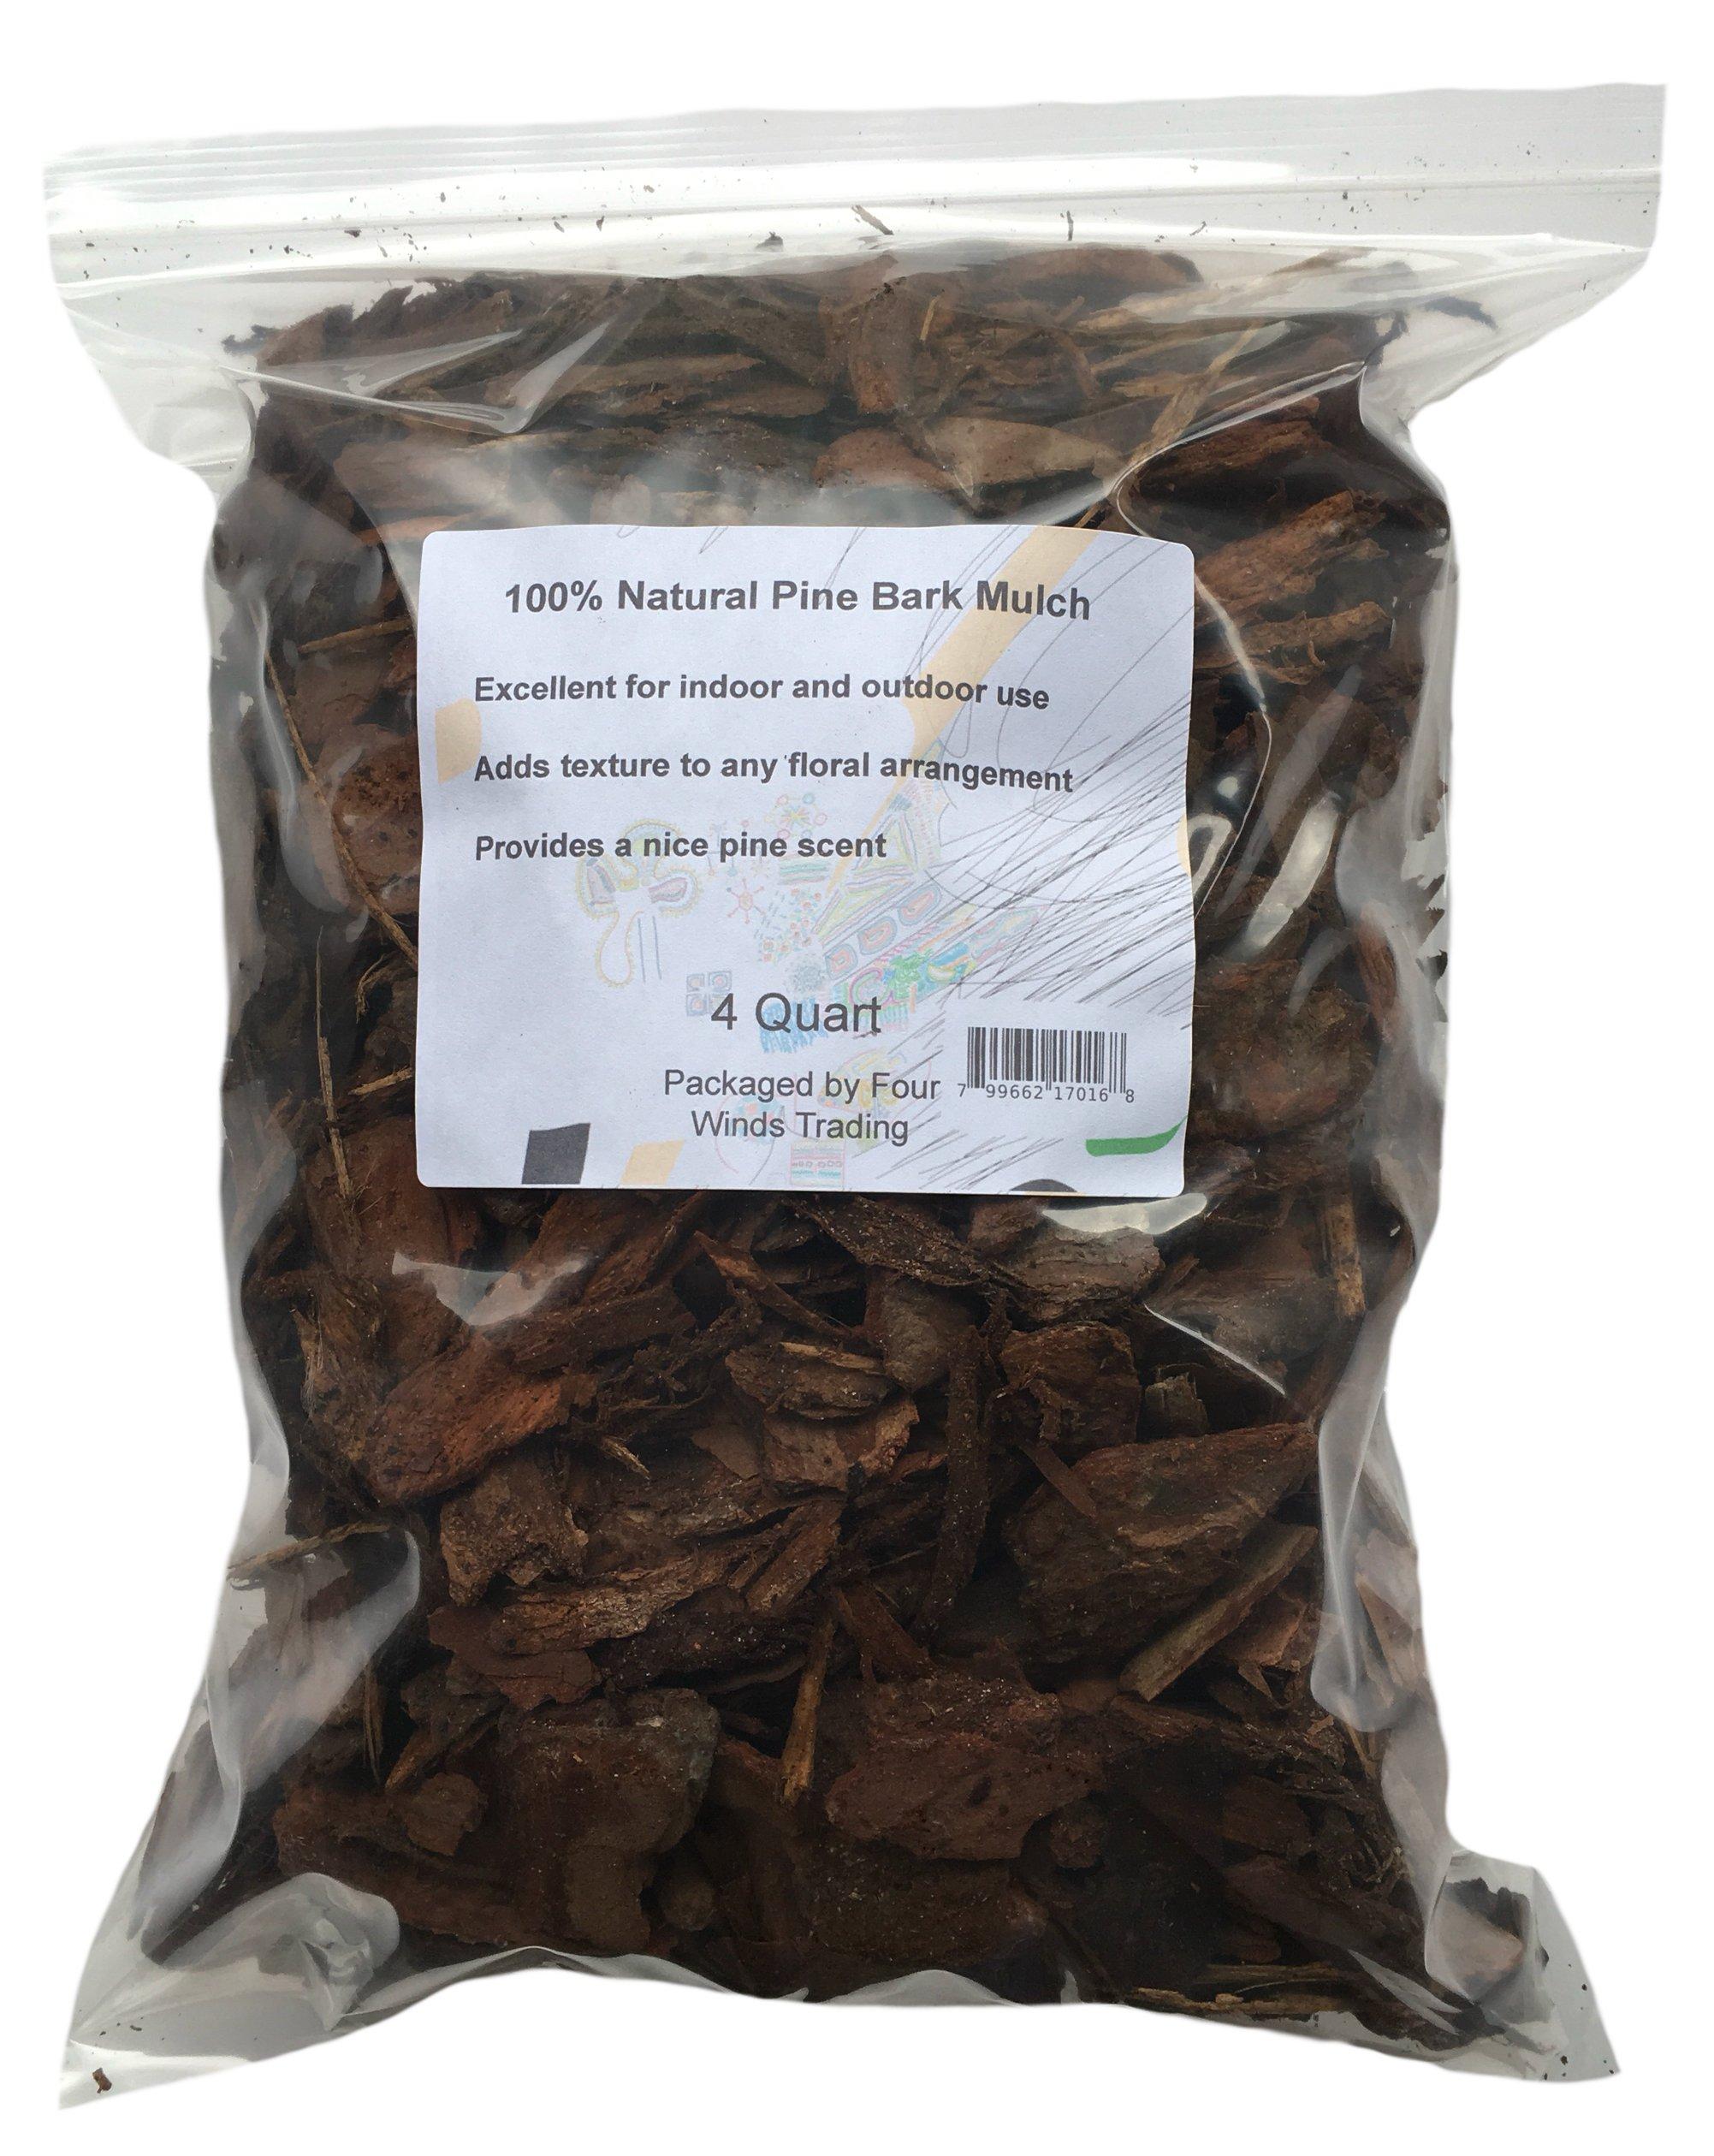 100% Pine Bark Mulch (4 Quart)